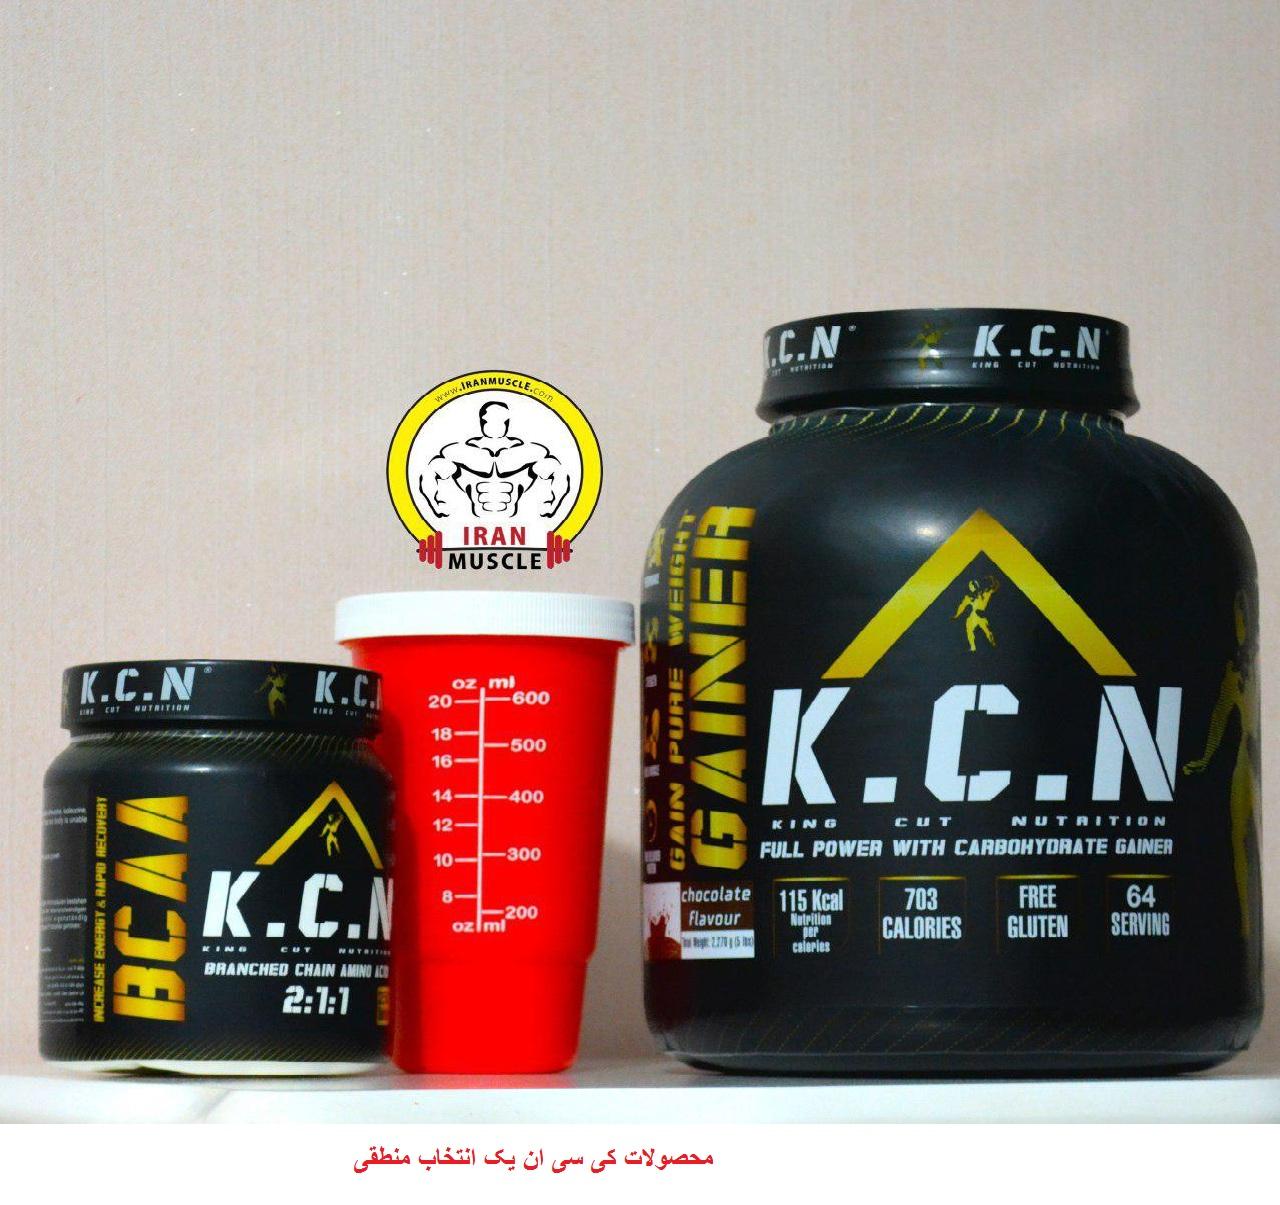 مکمل های ورزشی کی سی ان K.C.N